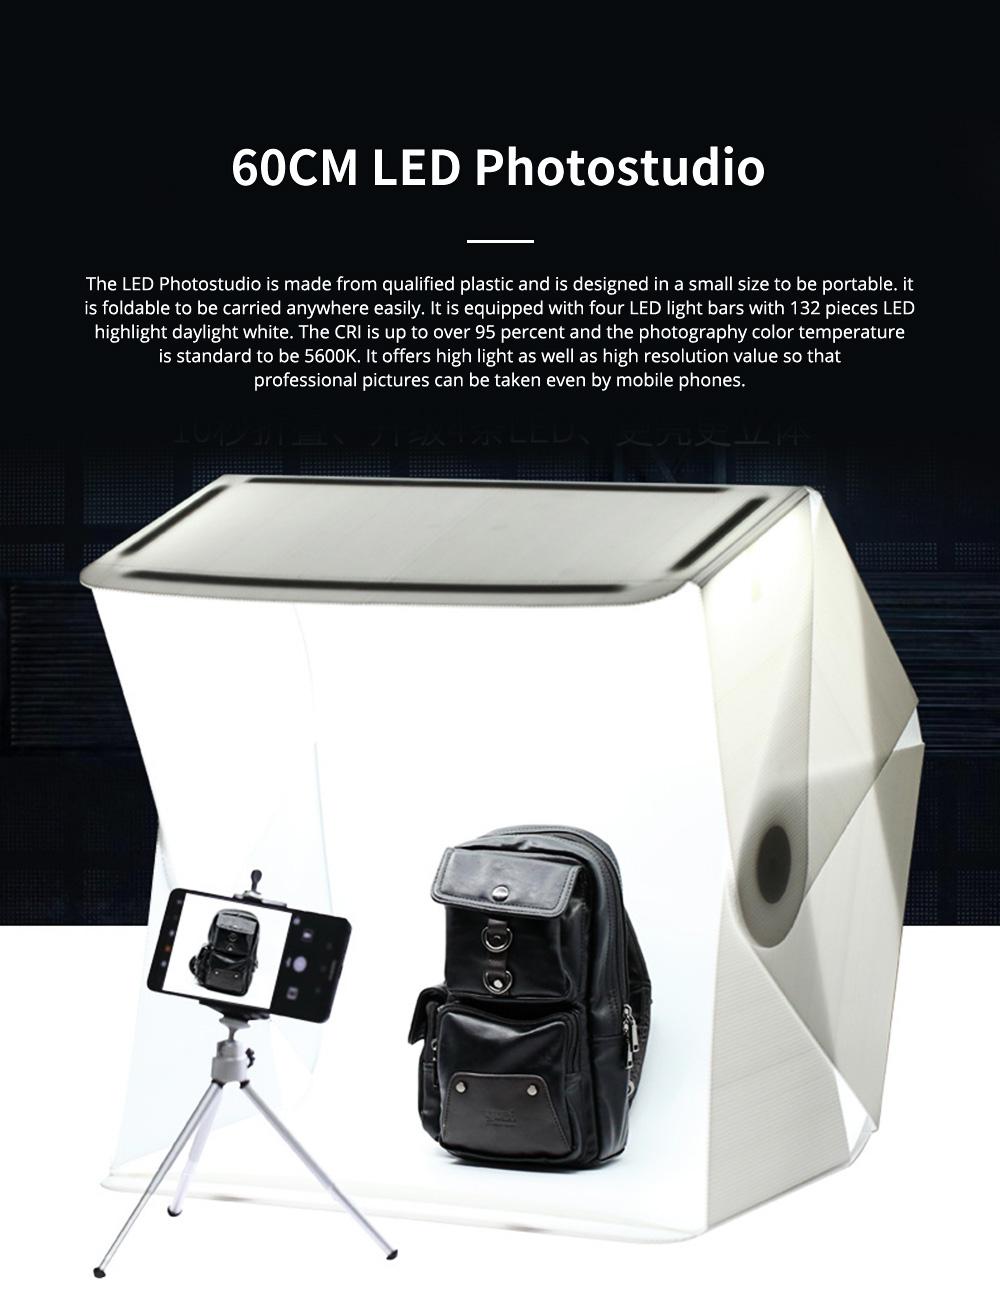 60CM Mini LED Photostudio for E-commerce Businessman Waterproof Foldable Picture Studio Fluorescent Lamp Plate Portable Photo Taking Studio Digital Imaging Box 0